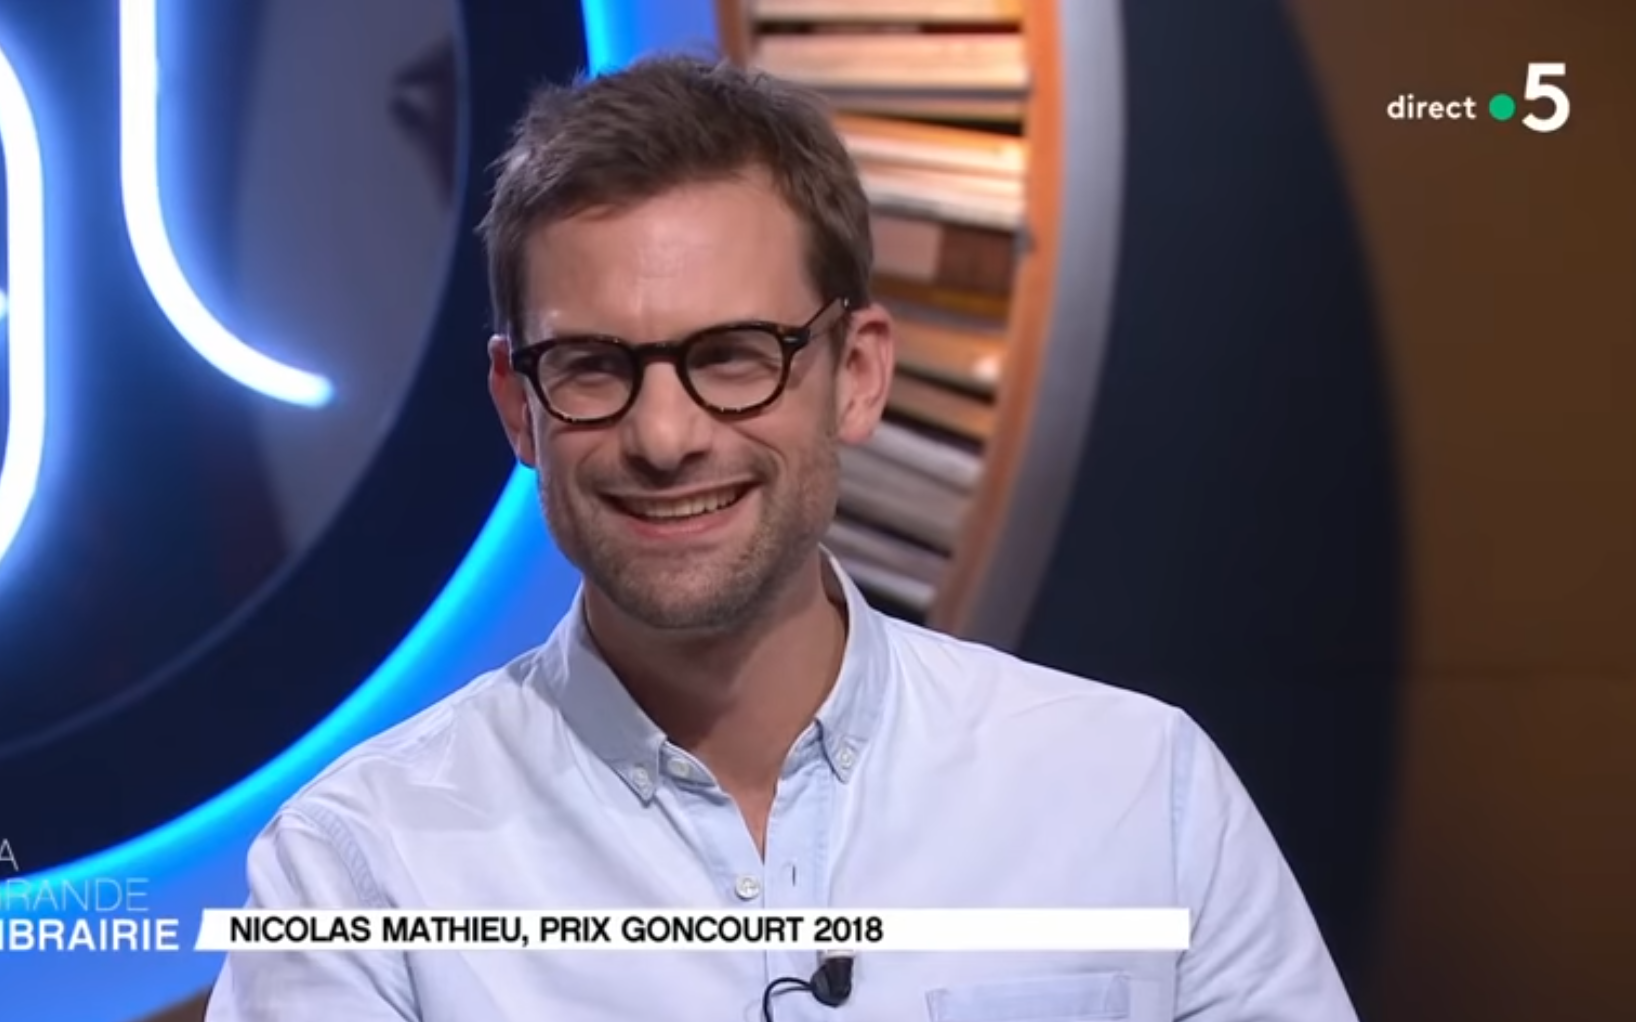 MathieuLGL